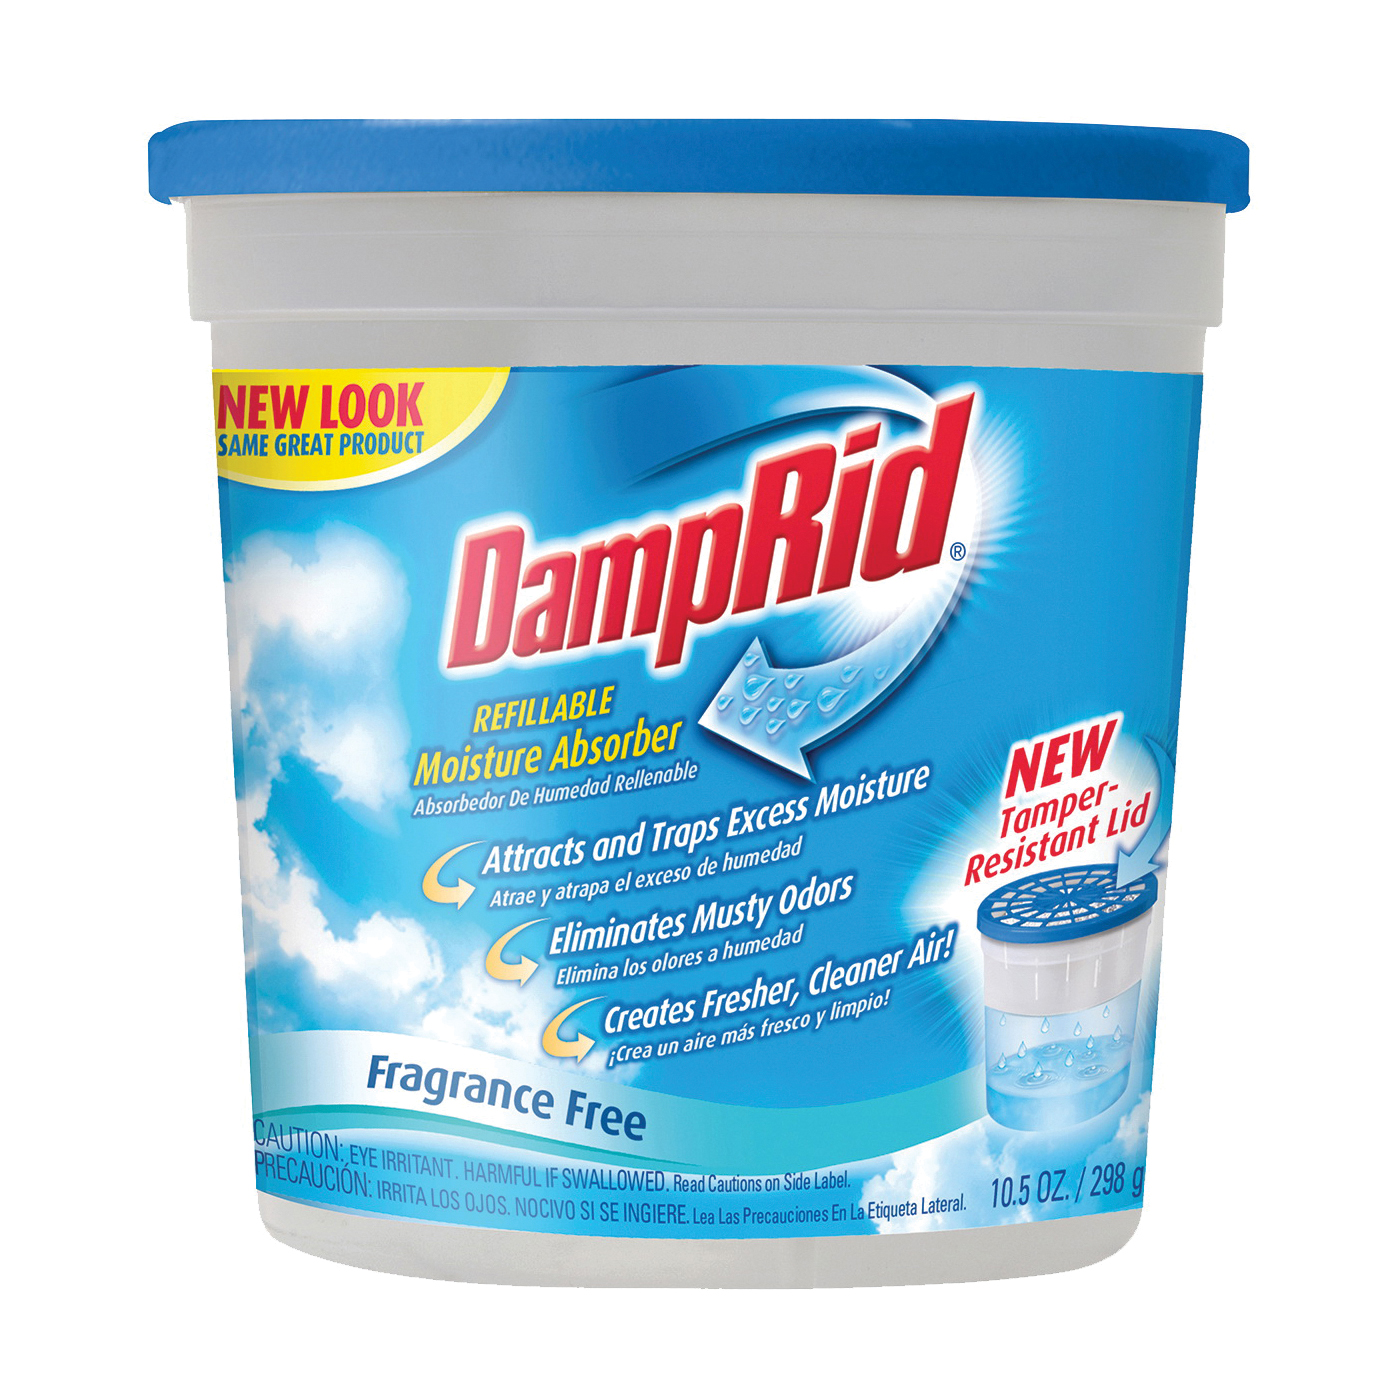 DampRid FG01K